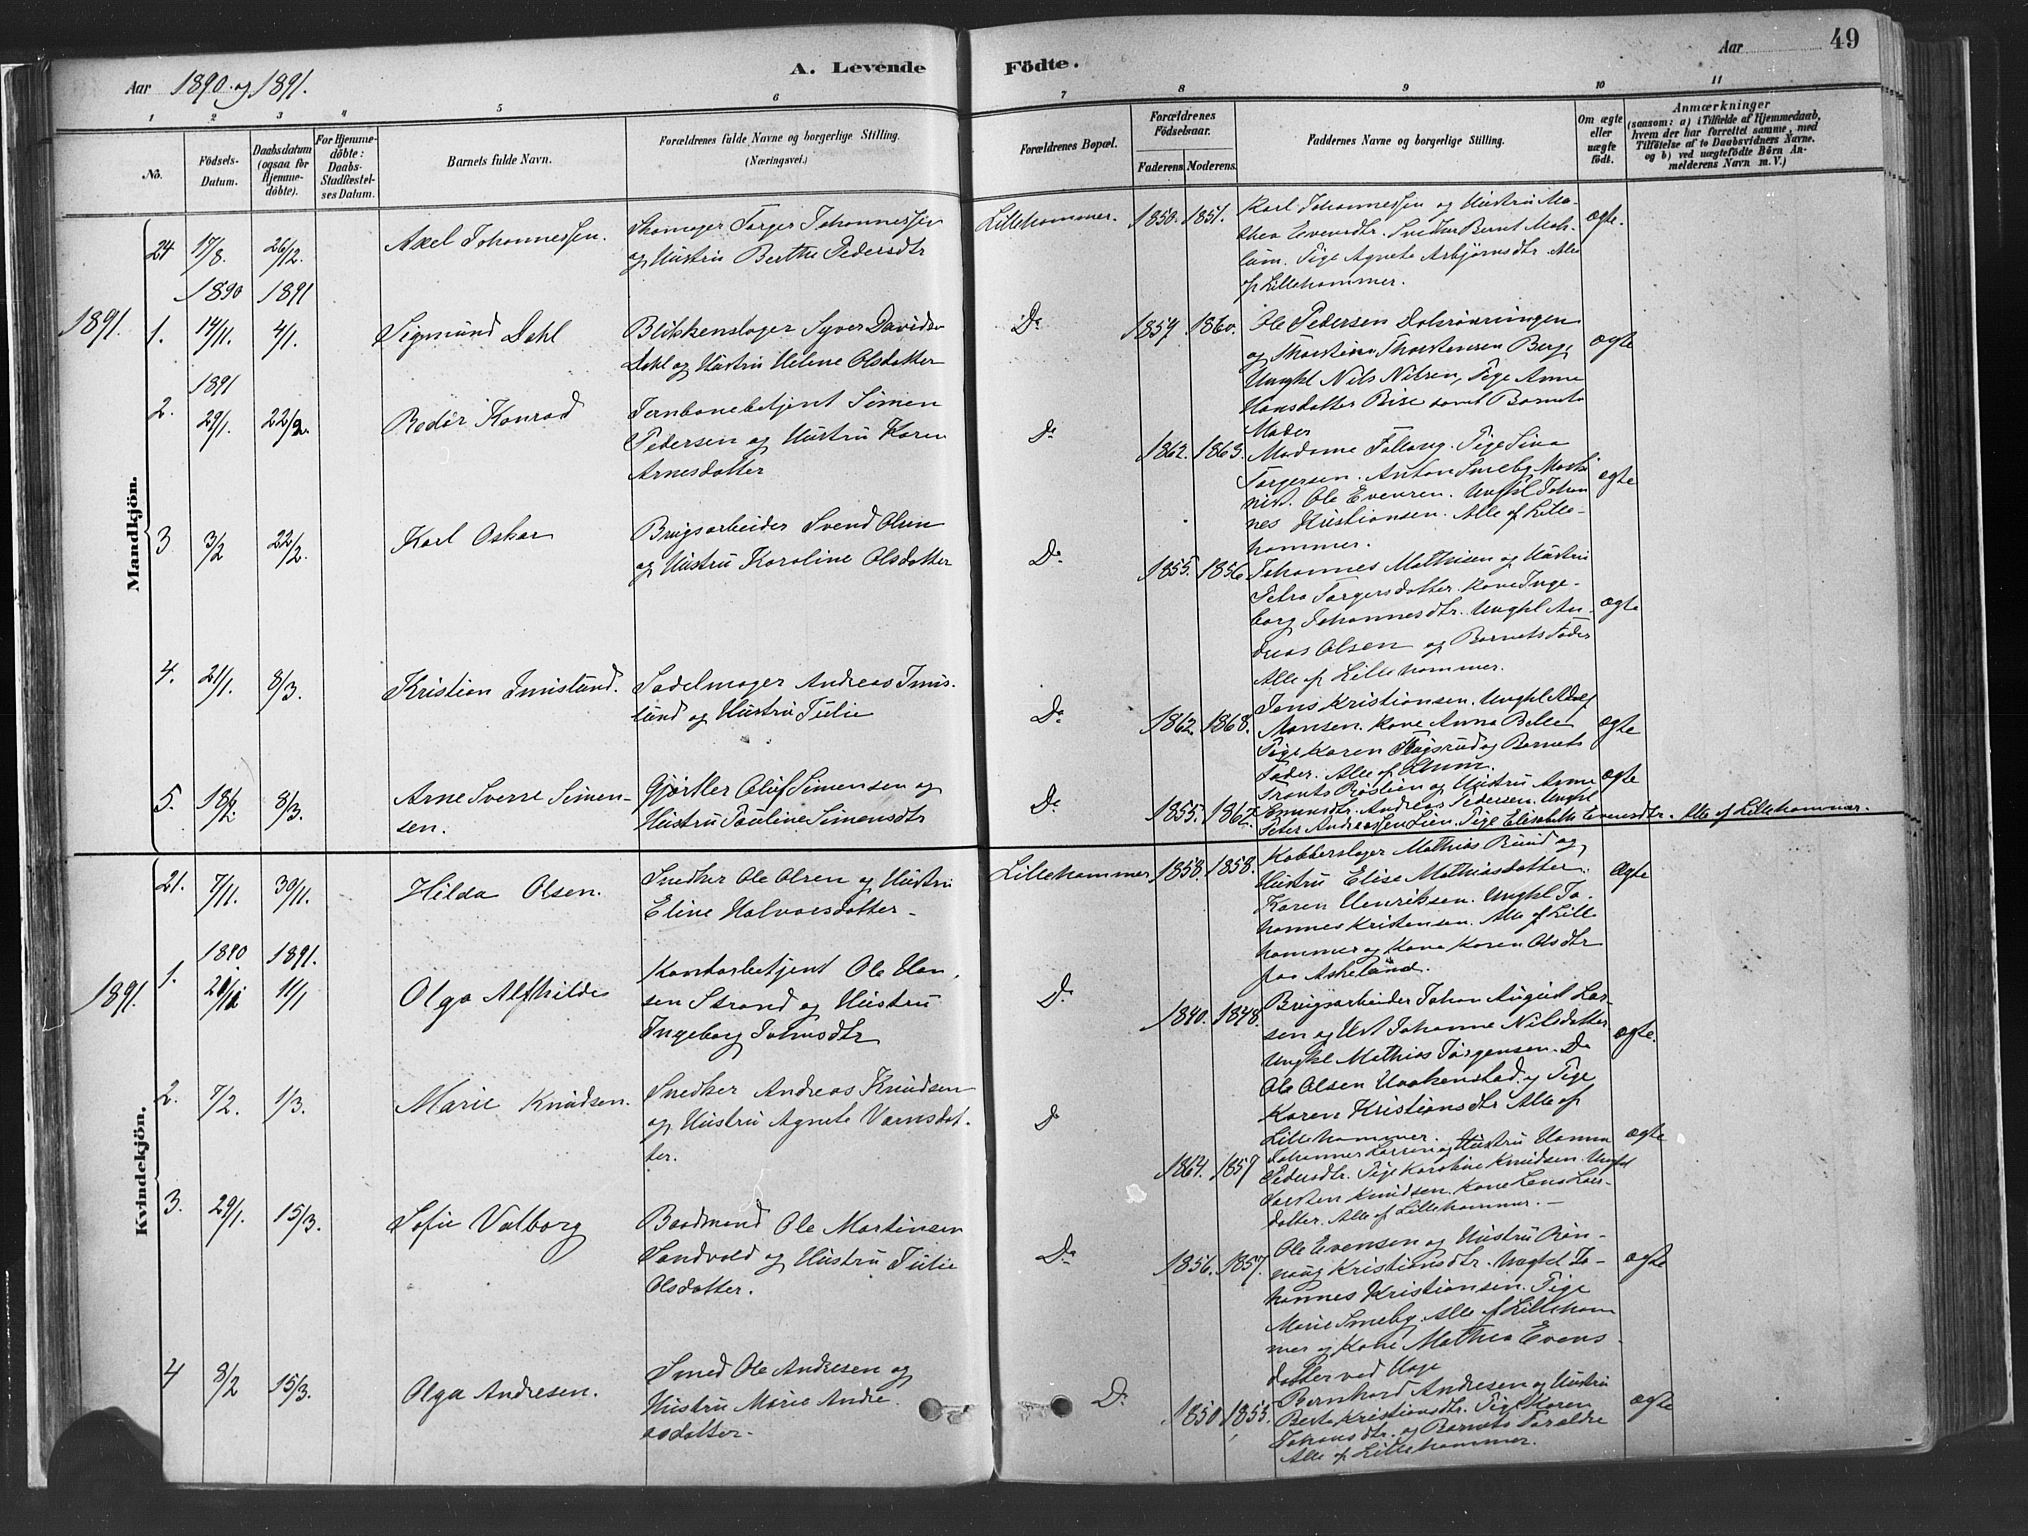 SAH, Fåberg prestekontor, H/Ha/Haa/L0010: Ministerialbok nr. 10, 1879-1900, s. 49